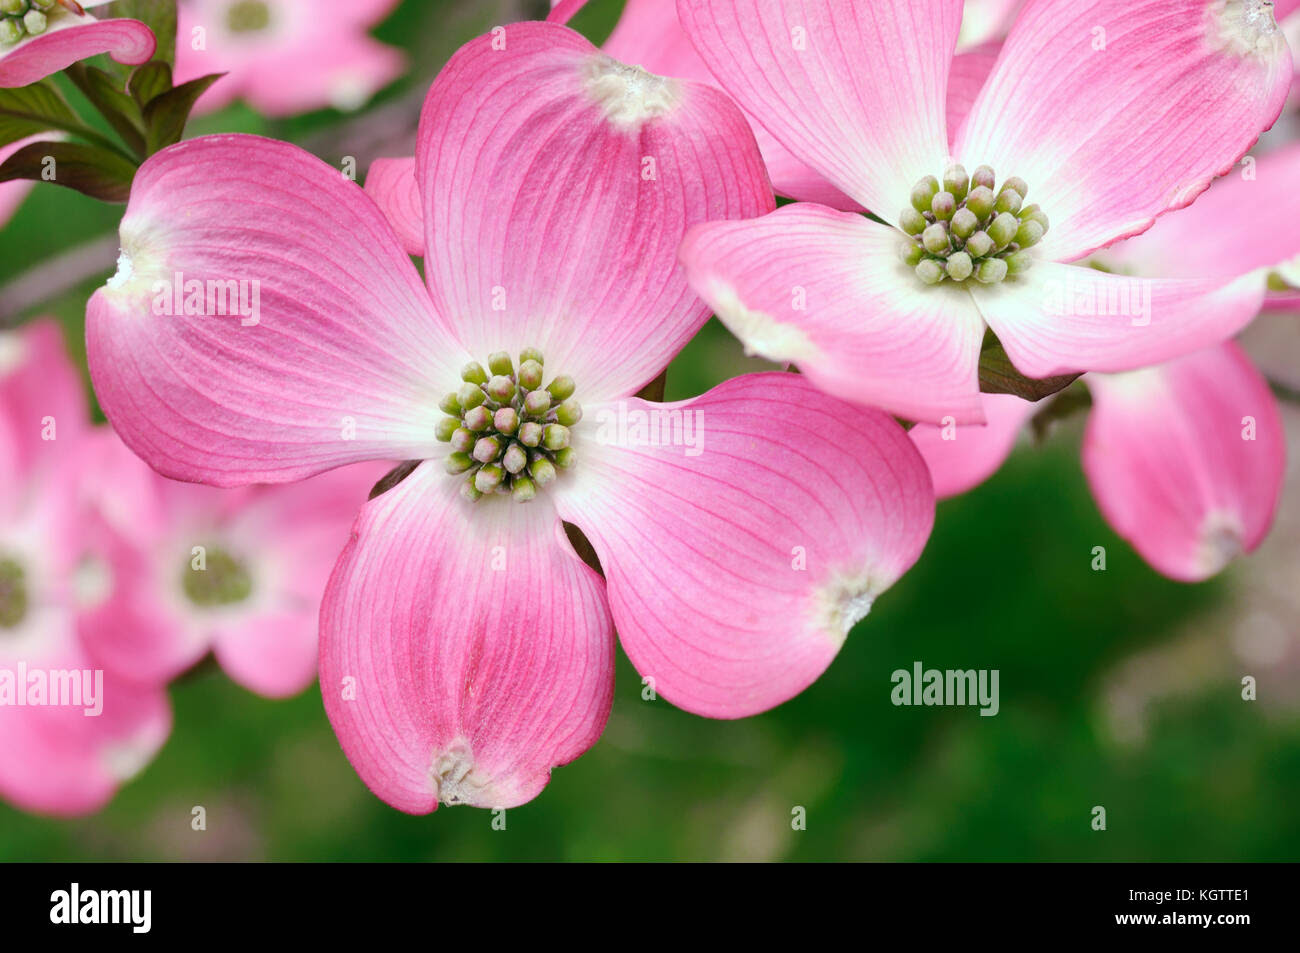 Pink Flowering Dogwood Flowers Close Up Stock Photo 165273865 Alamy